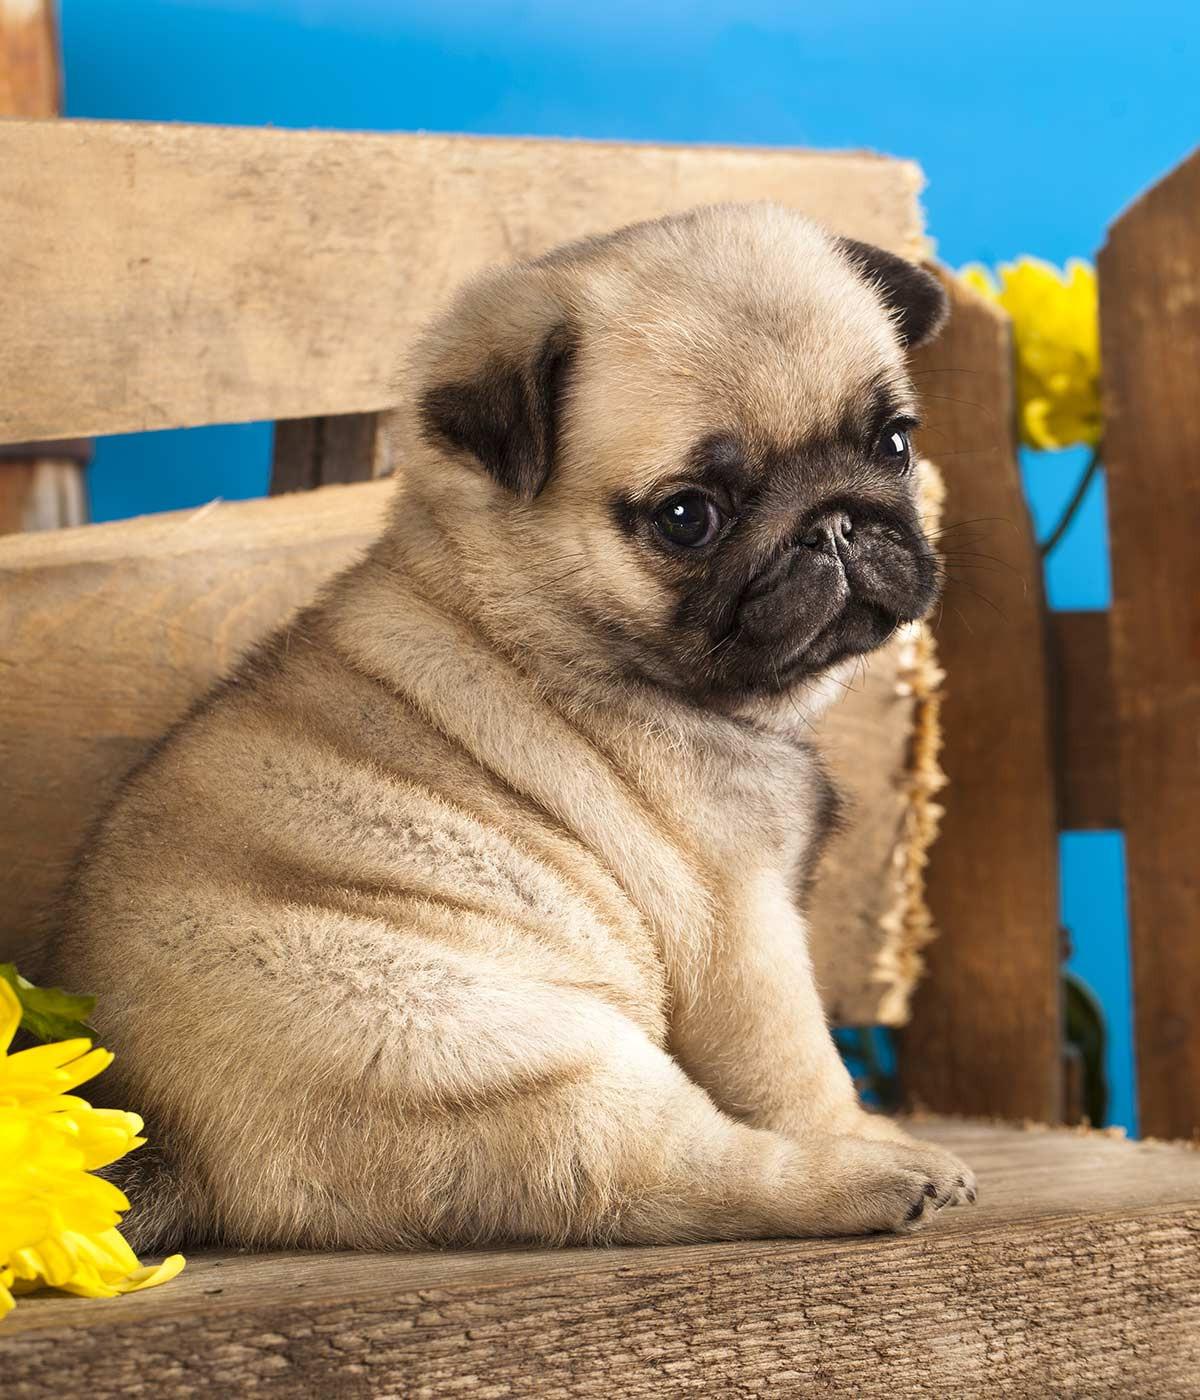 Rescue Pug Puppies For Sale | Florida City, FL #291355 | Petzlover